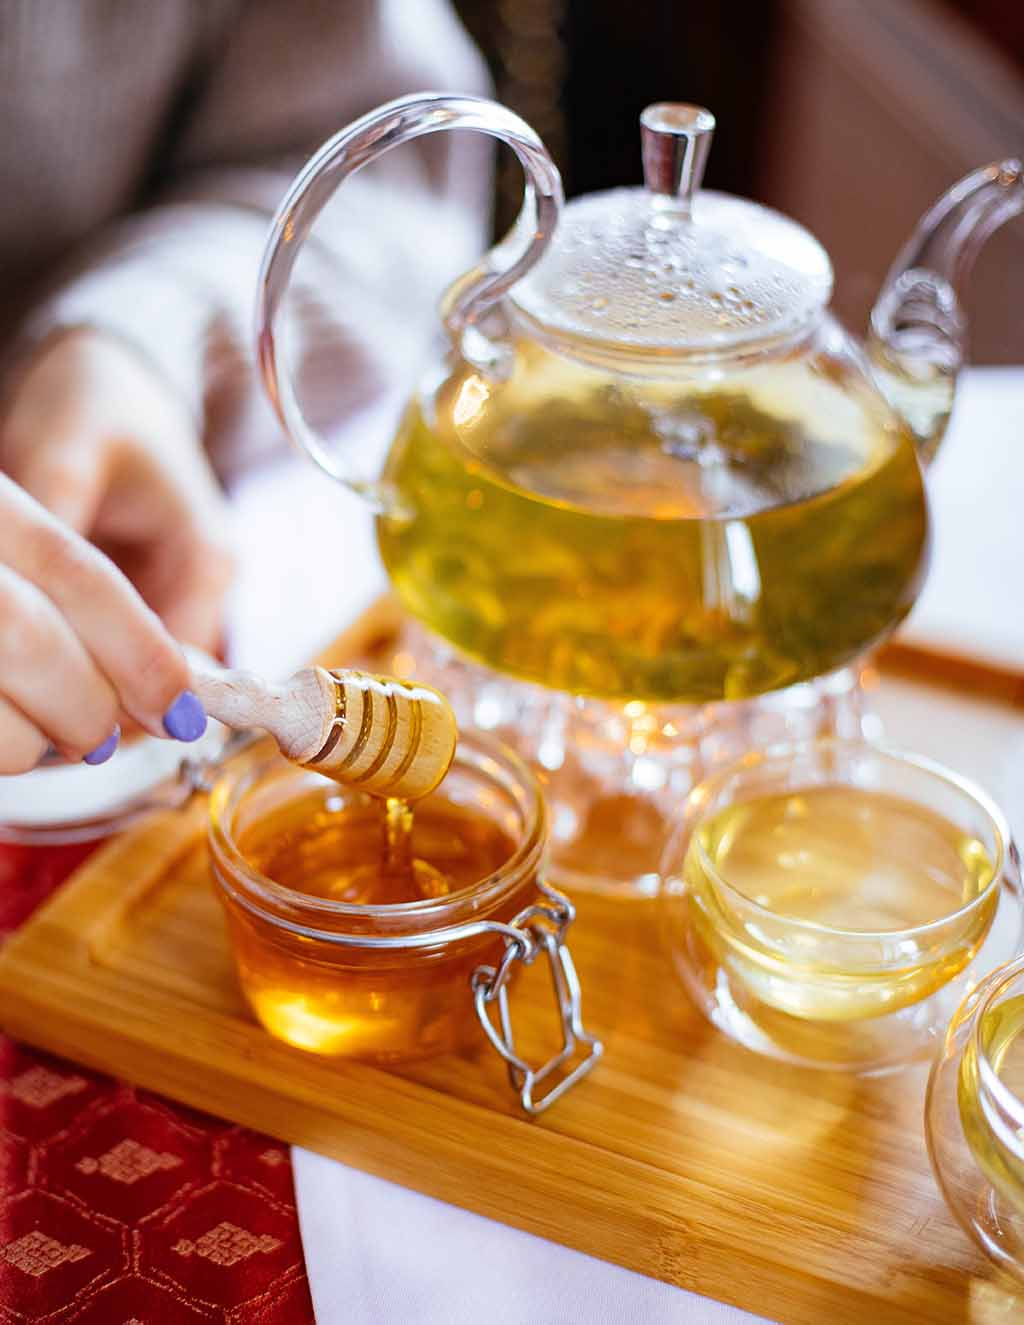 ceaiuri pentru stres Ezenpur Day Spa